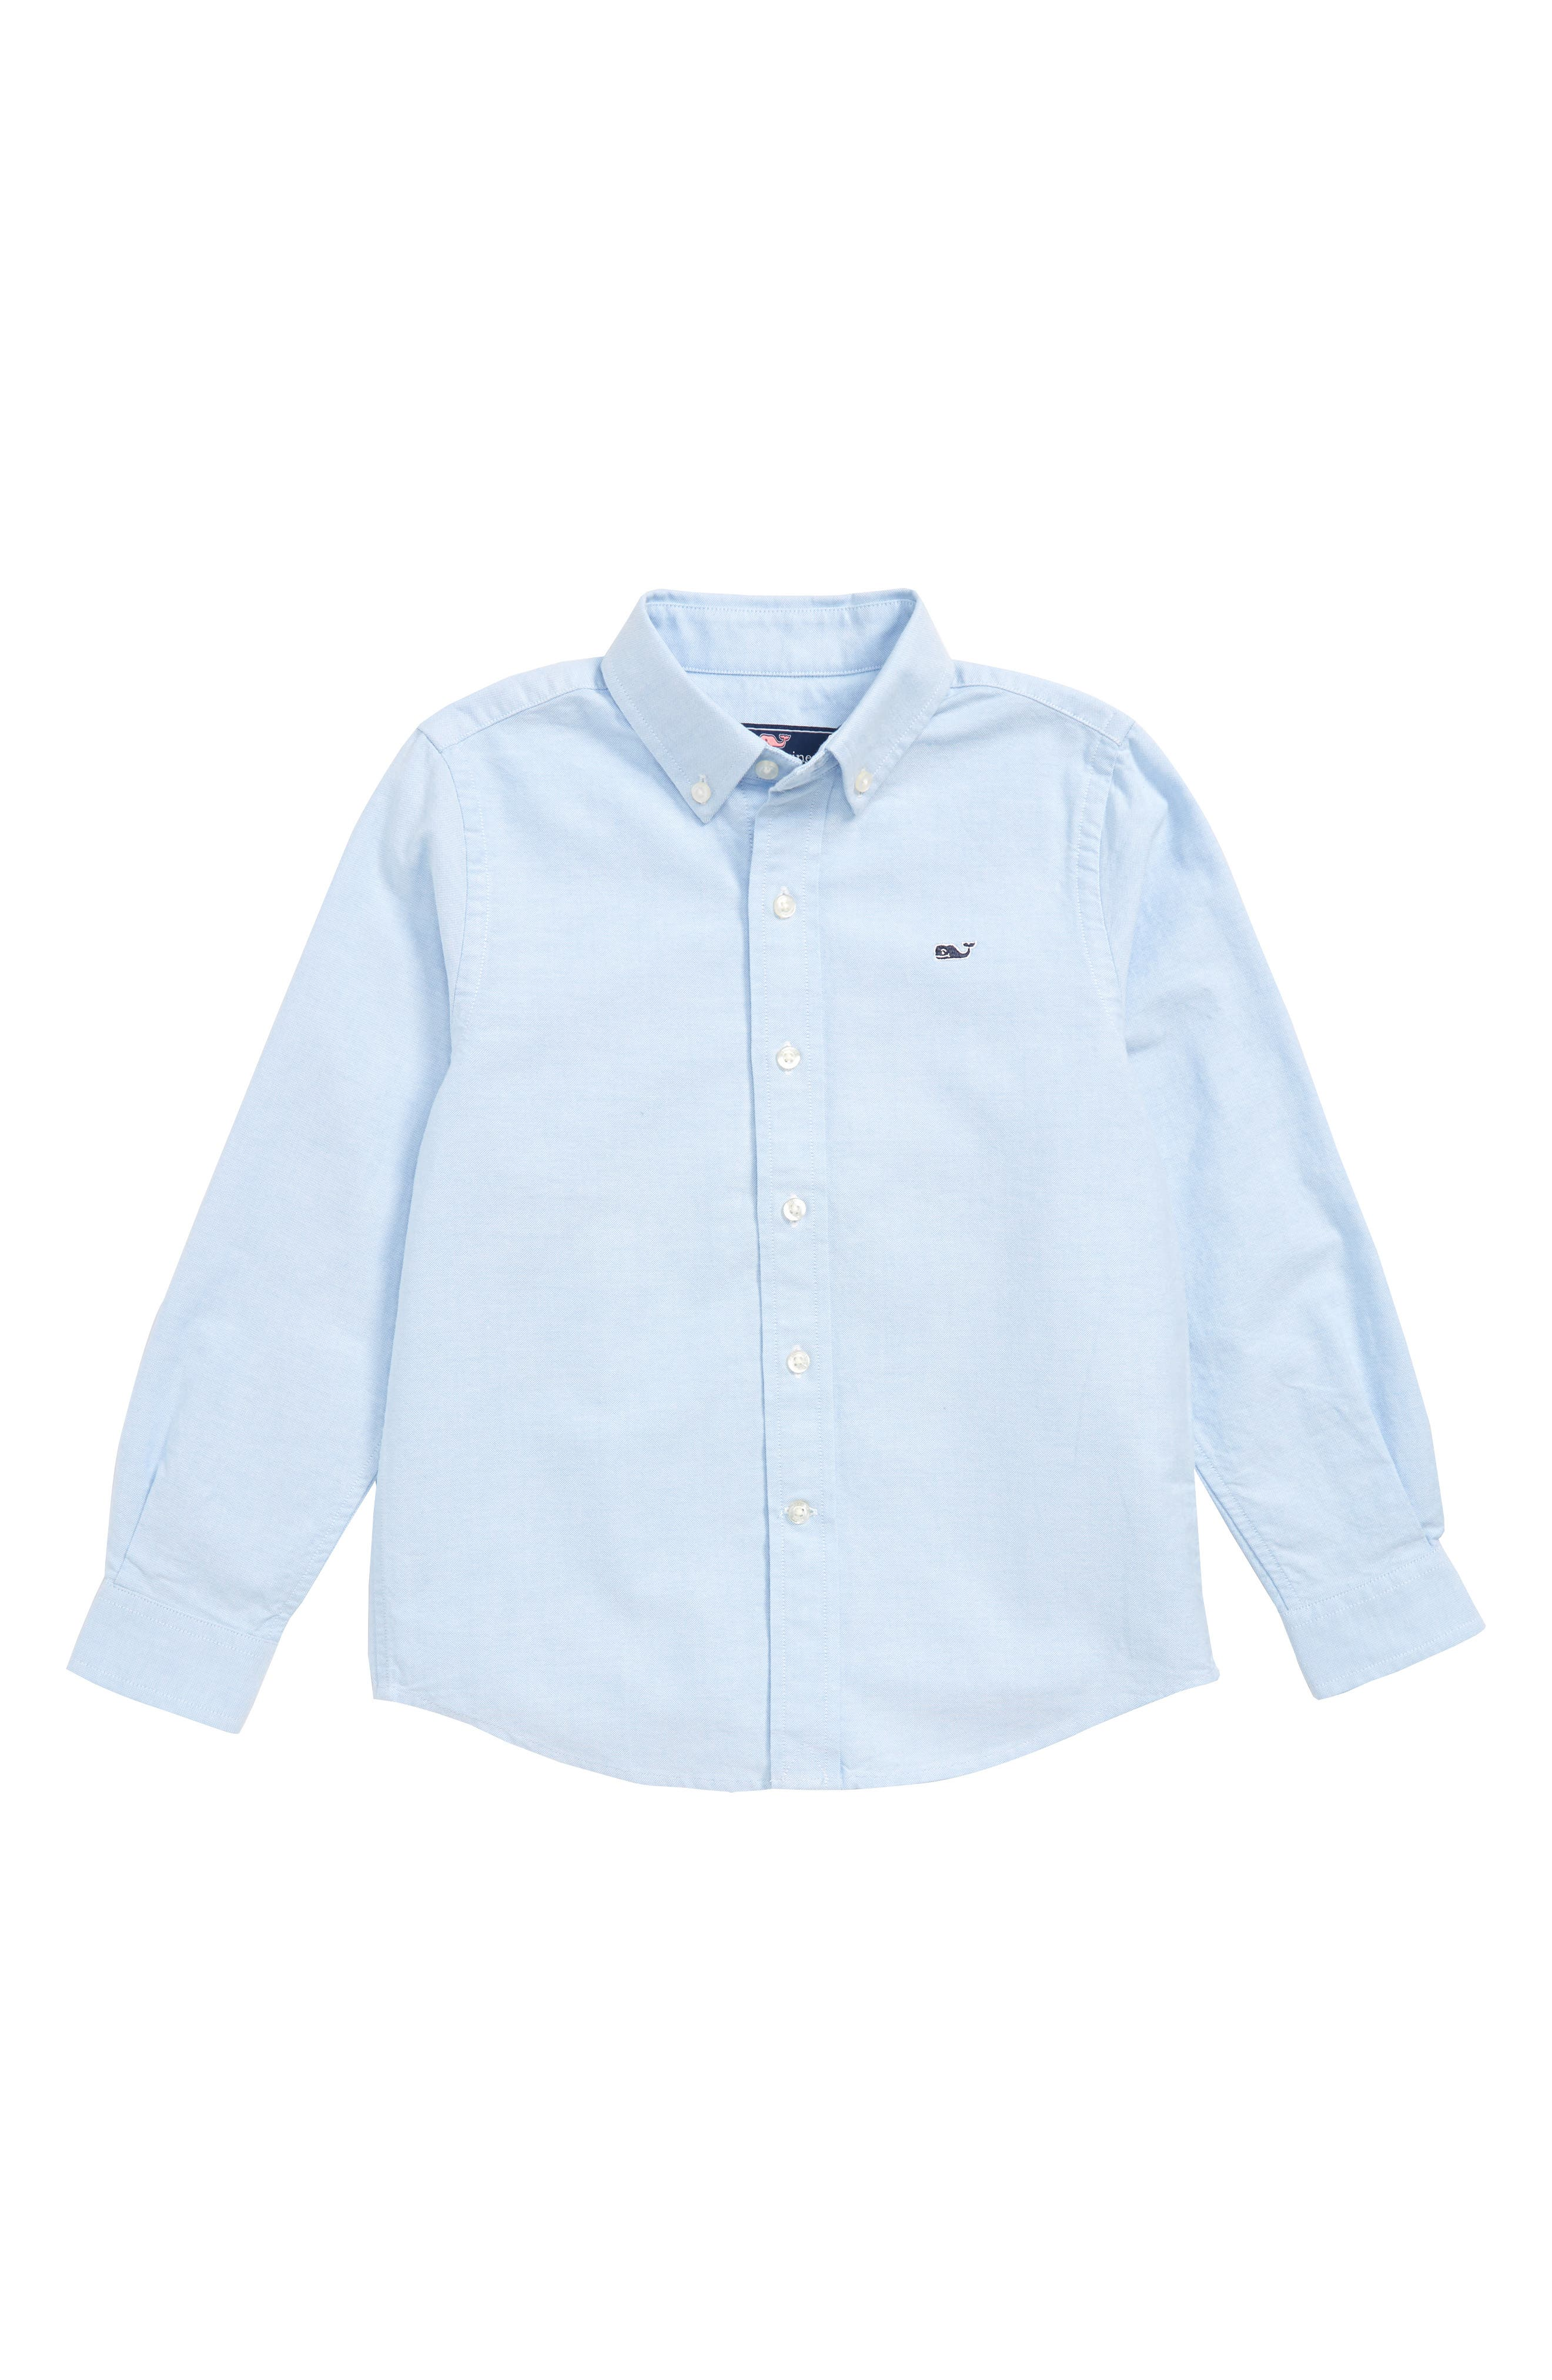 Woven Oxford Shirt,                         Main,                         color, OCEAN BREEZE